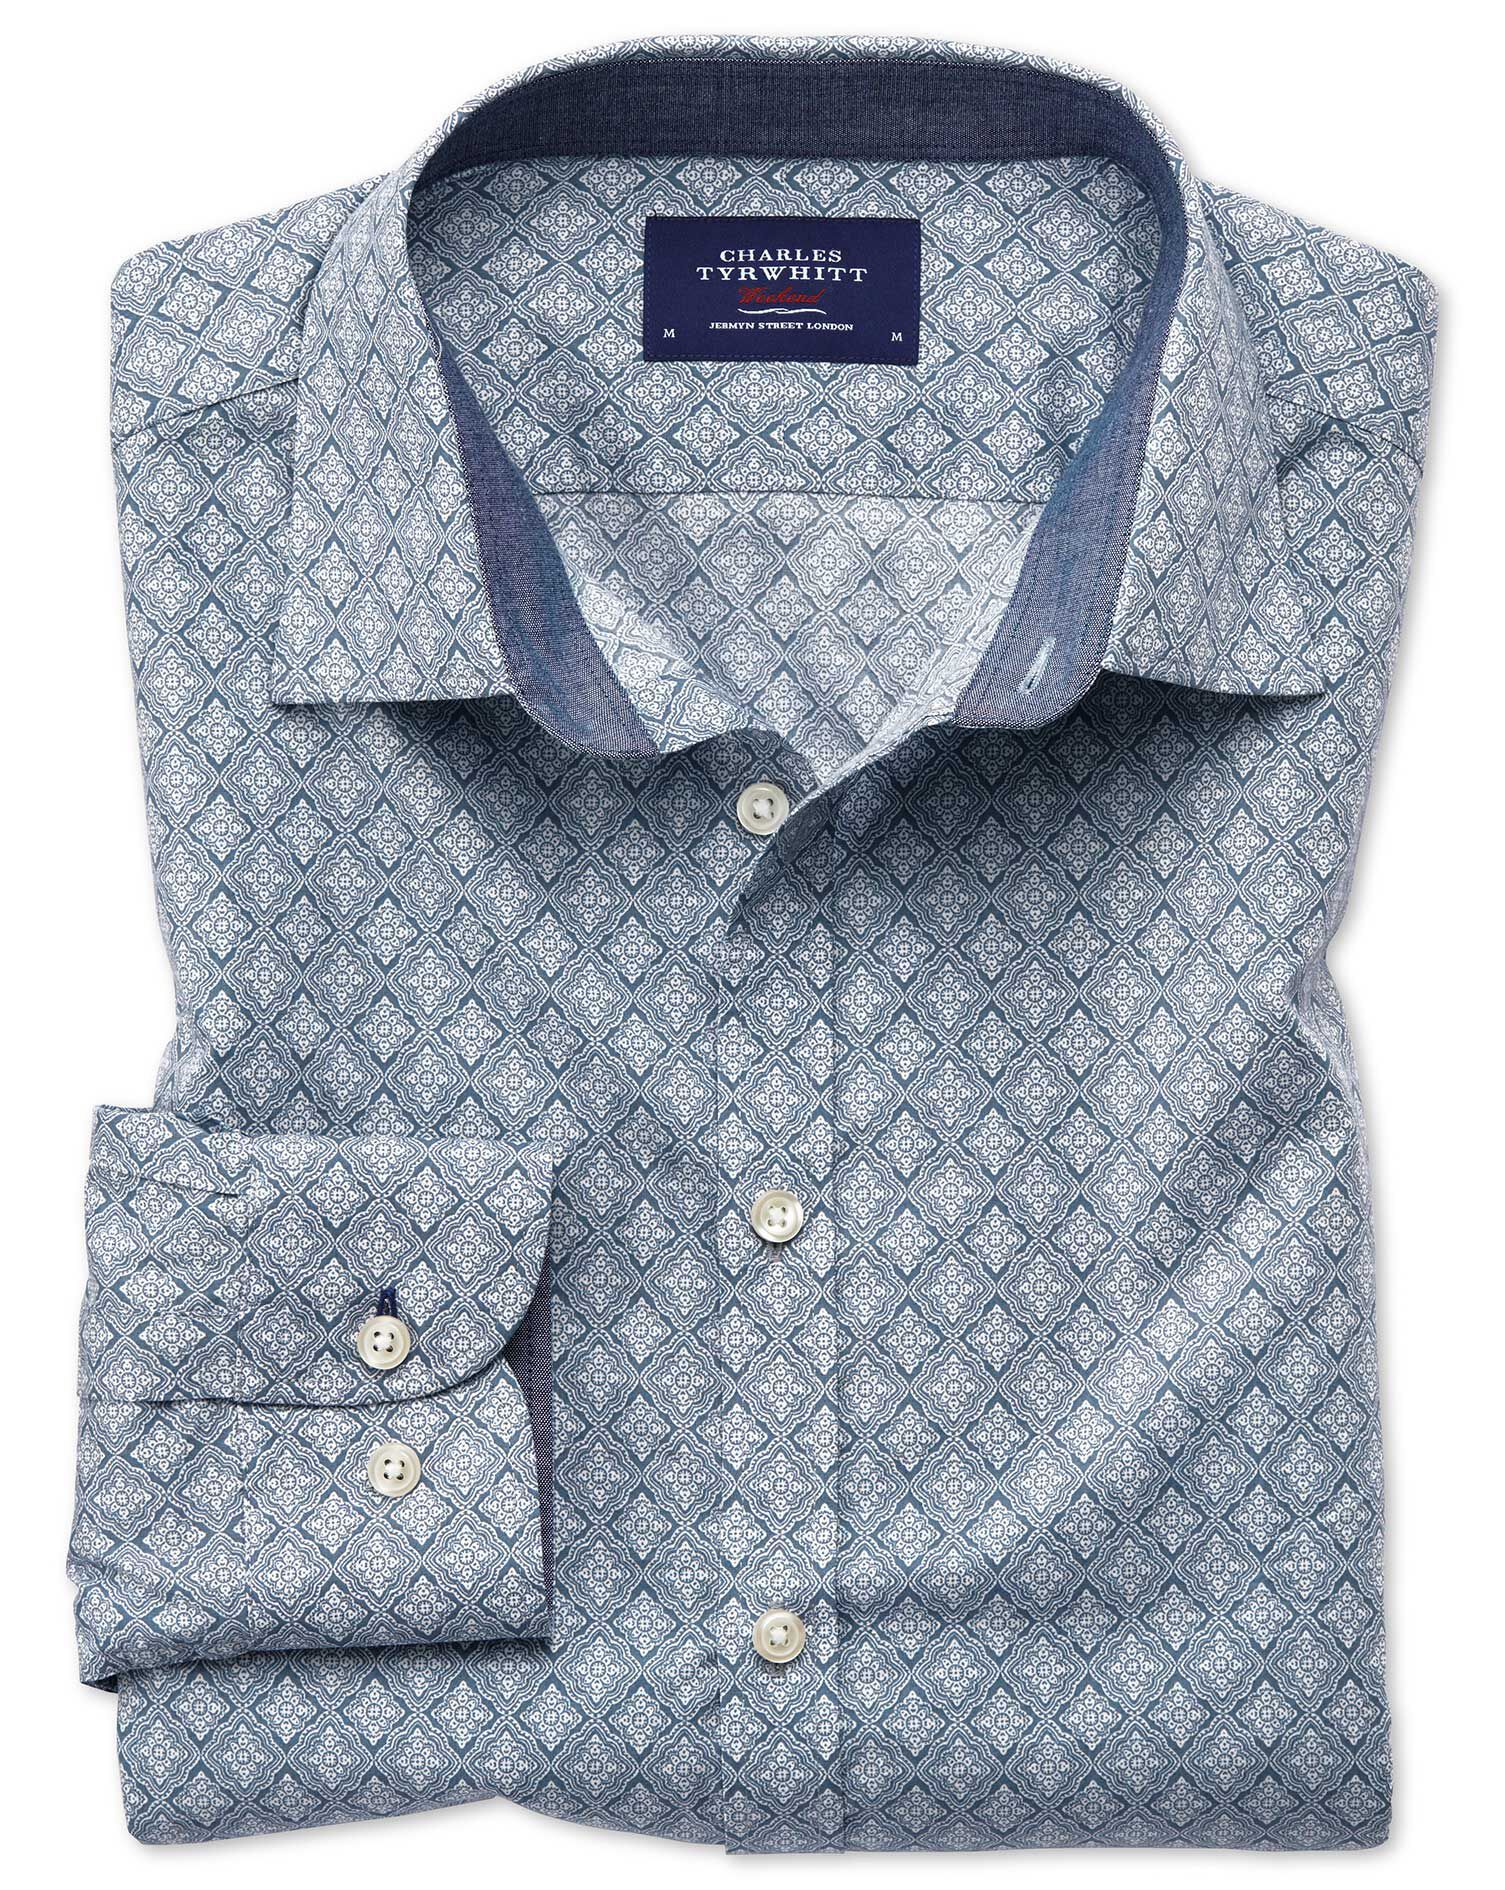 Extra Slim Fit Light Grey Diamond Print Cotton Shirt Single Cuff Size XXL by Charles Tyrwhitt